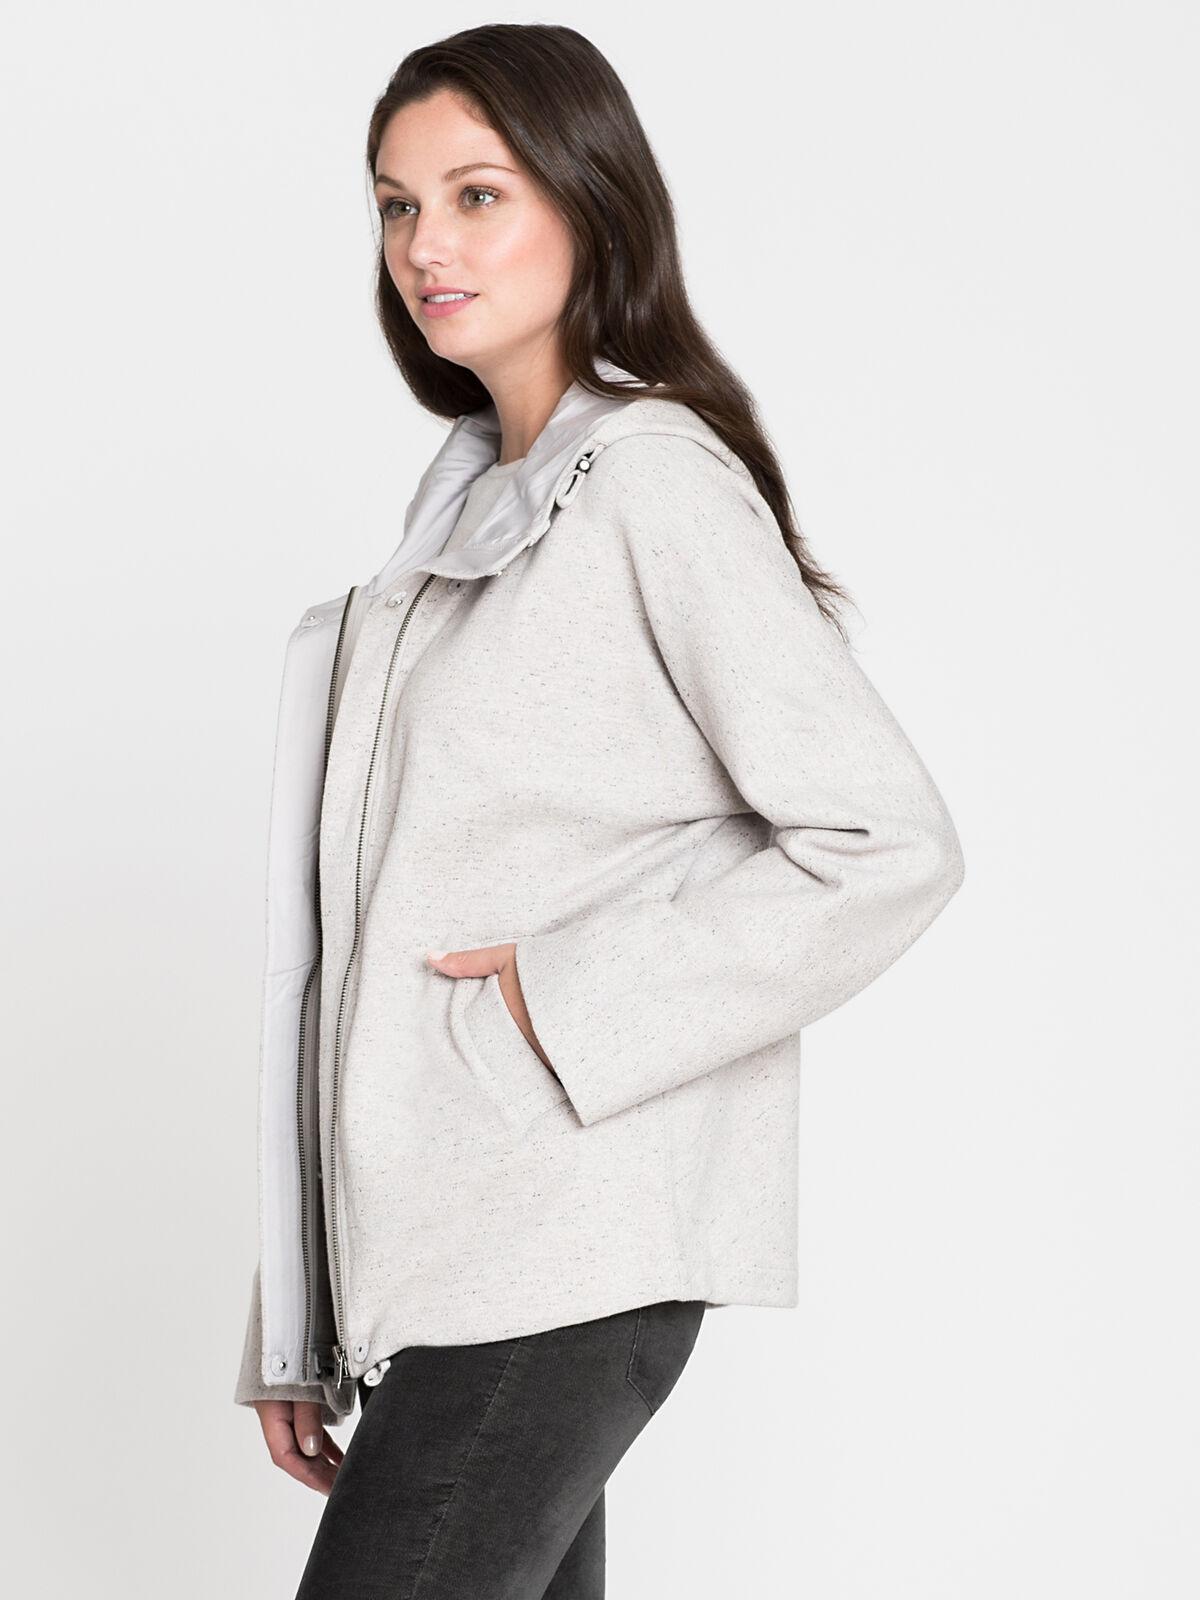 Effortless Chic Jacket